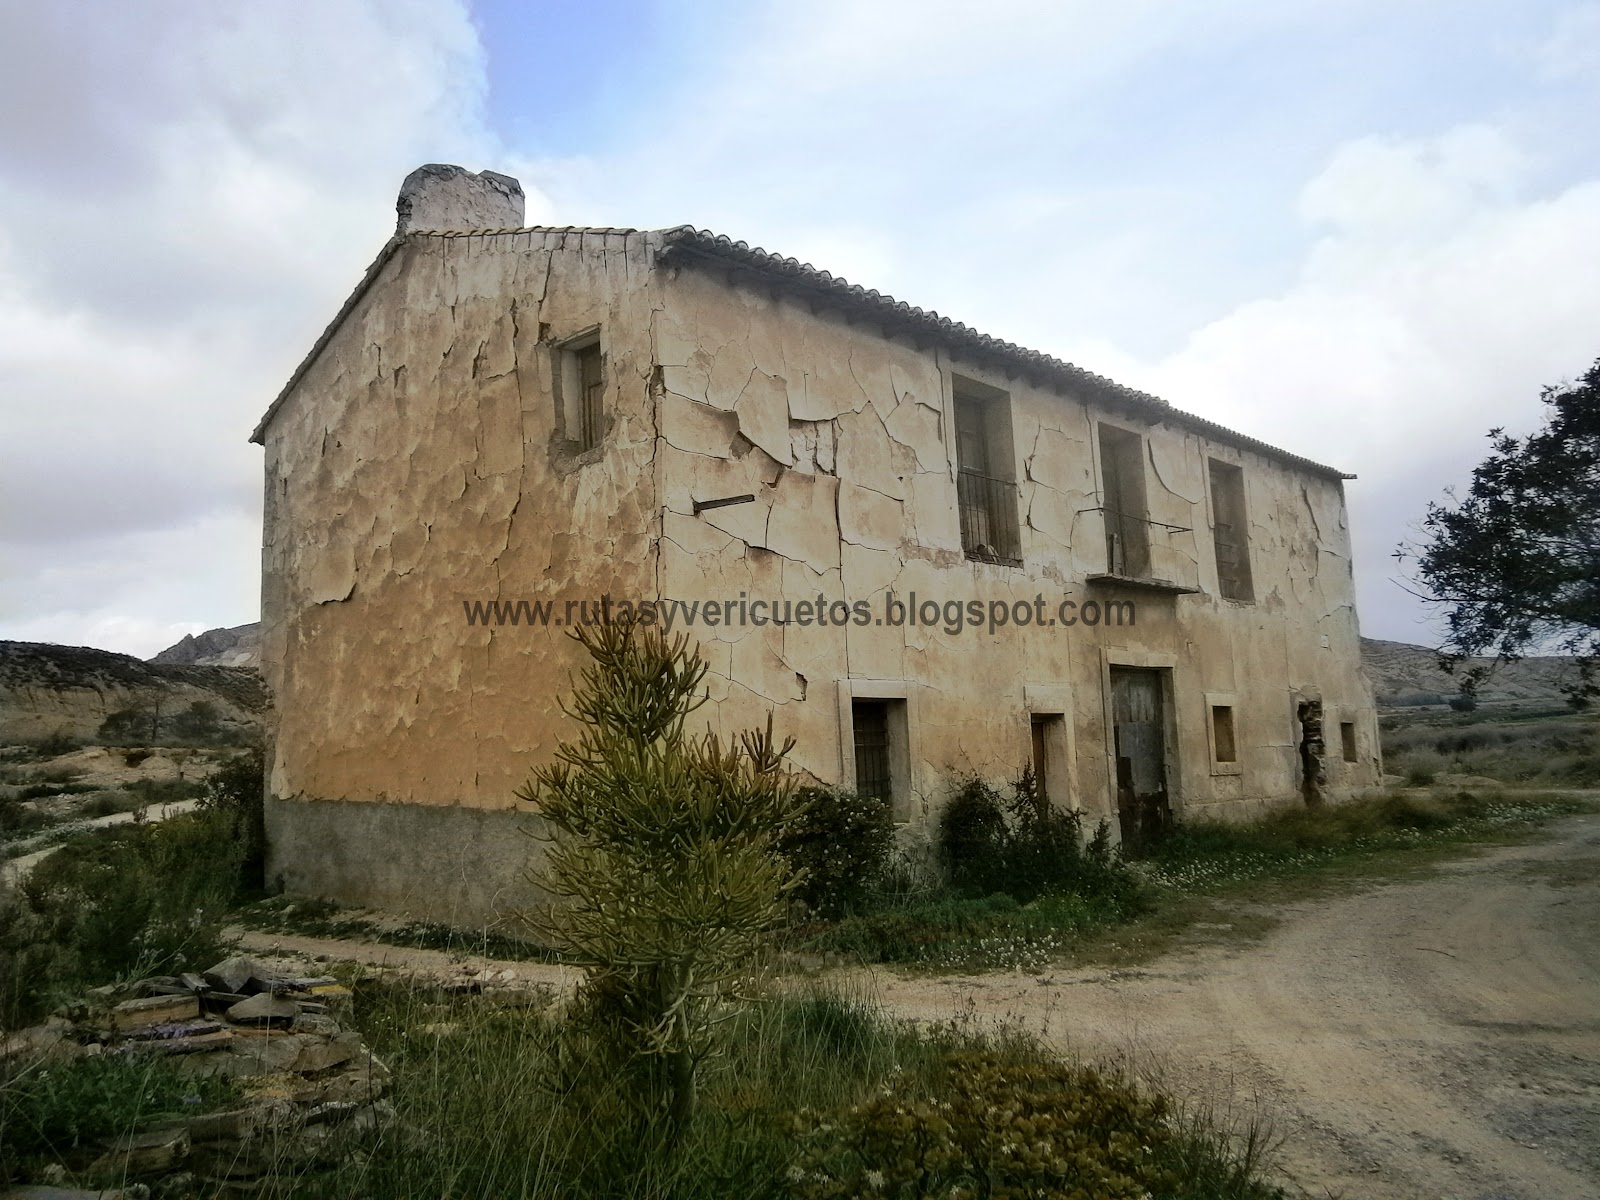 Casa de Lo Navarelo